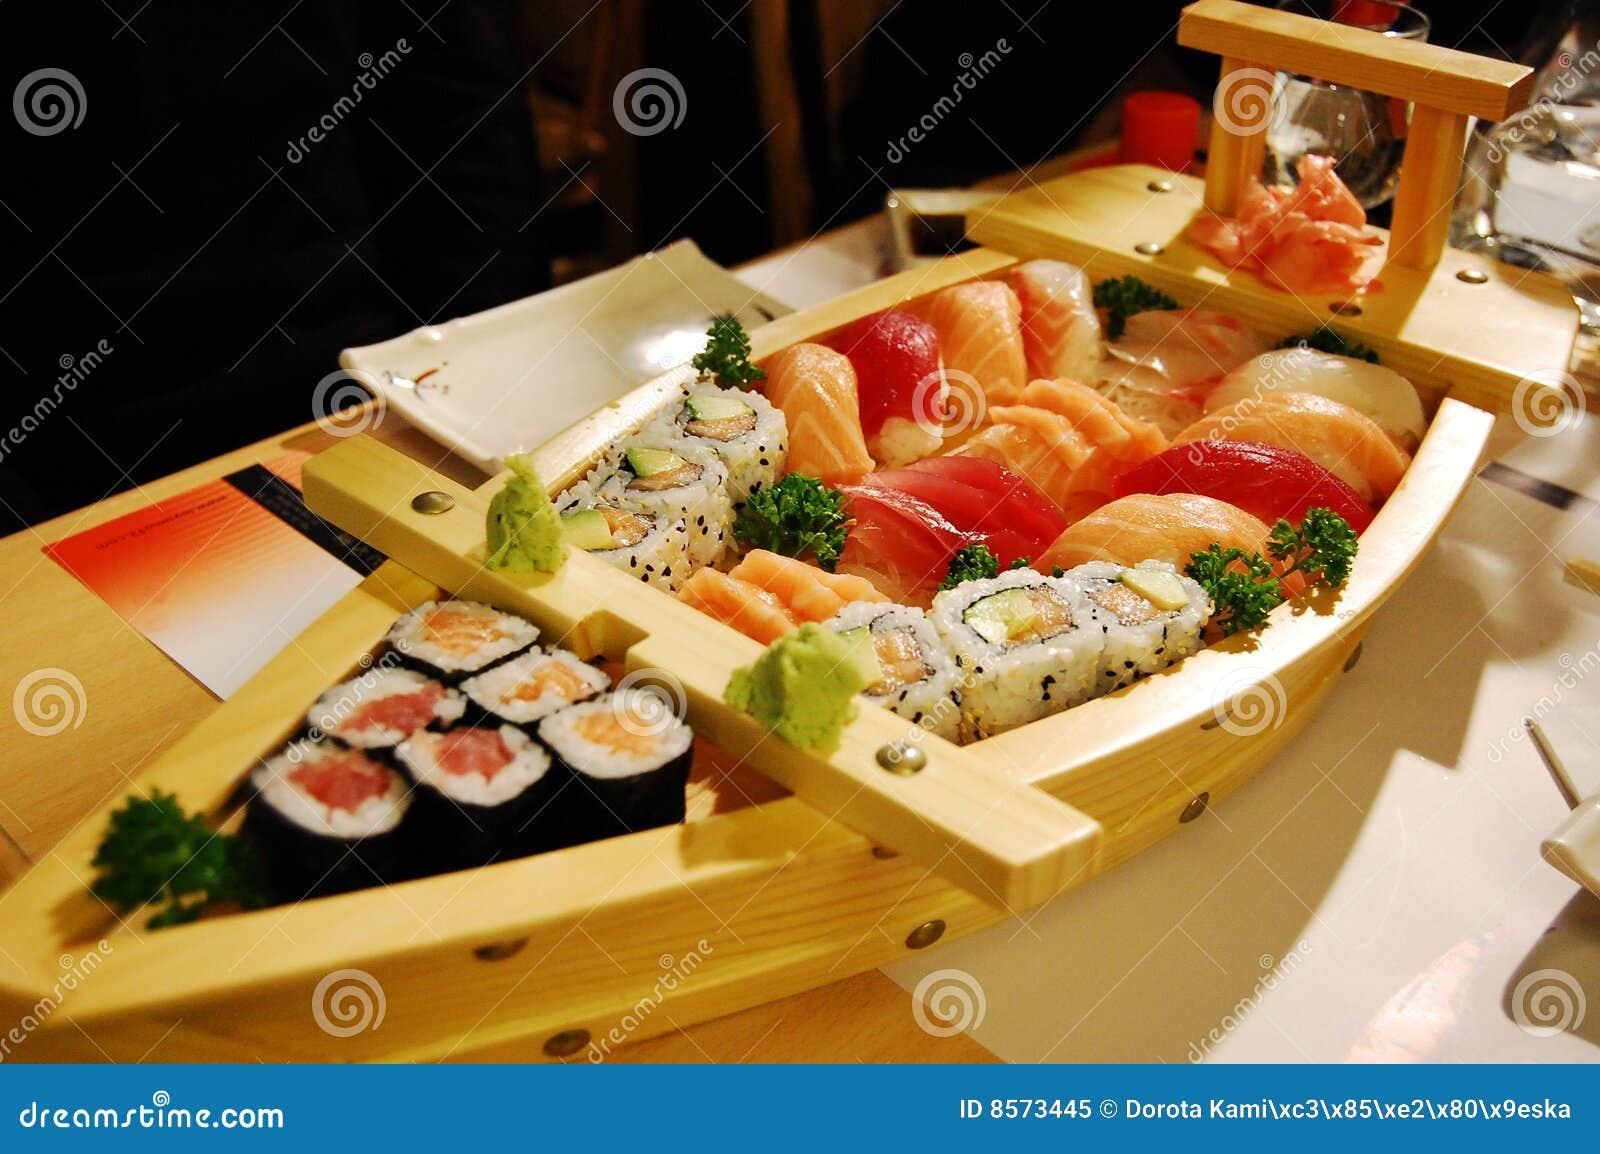 Small Boat With Sushi V3 Royalty Free Stock Photo - Image: 8573445